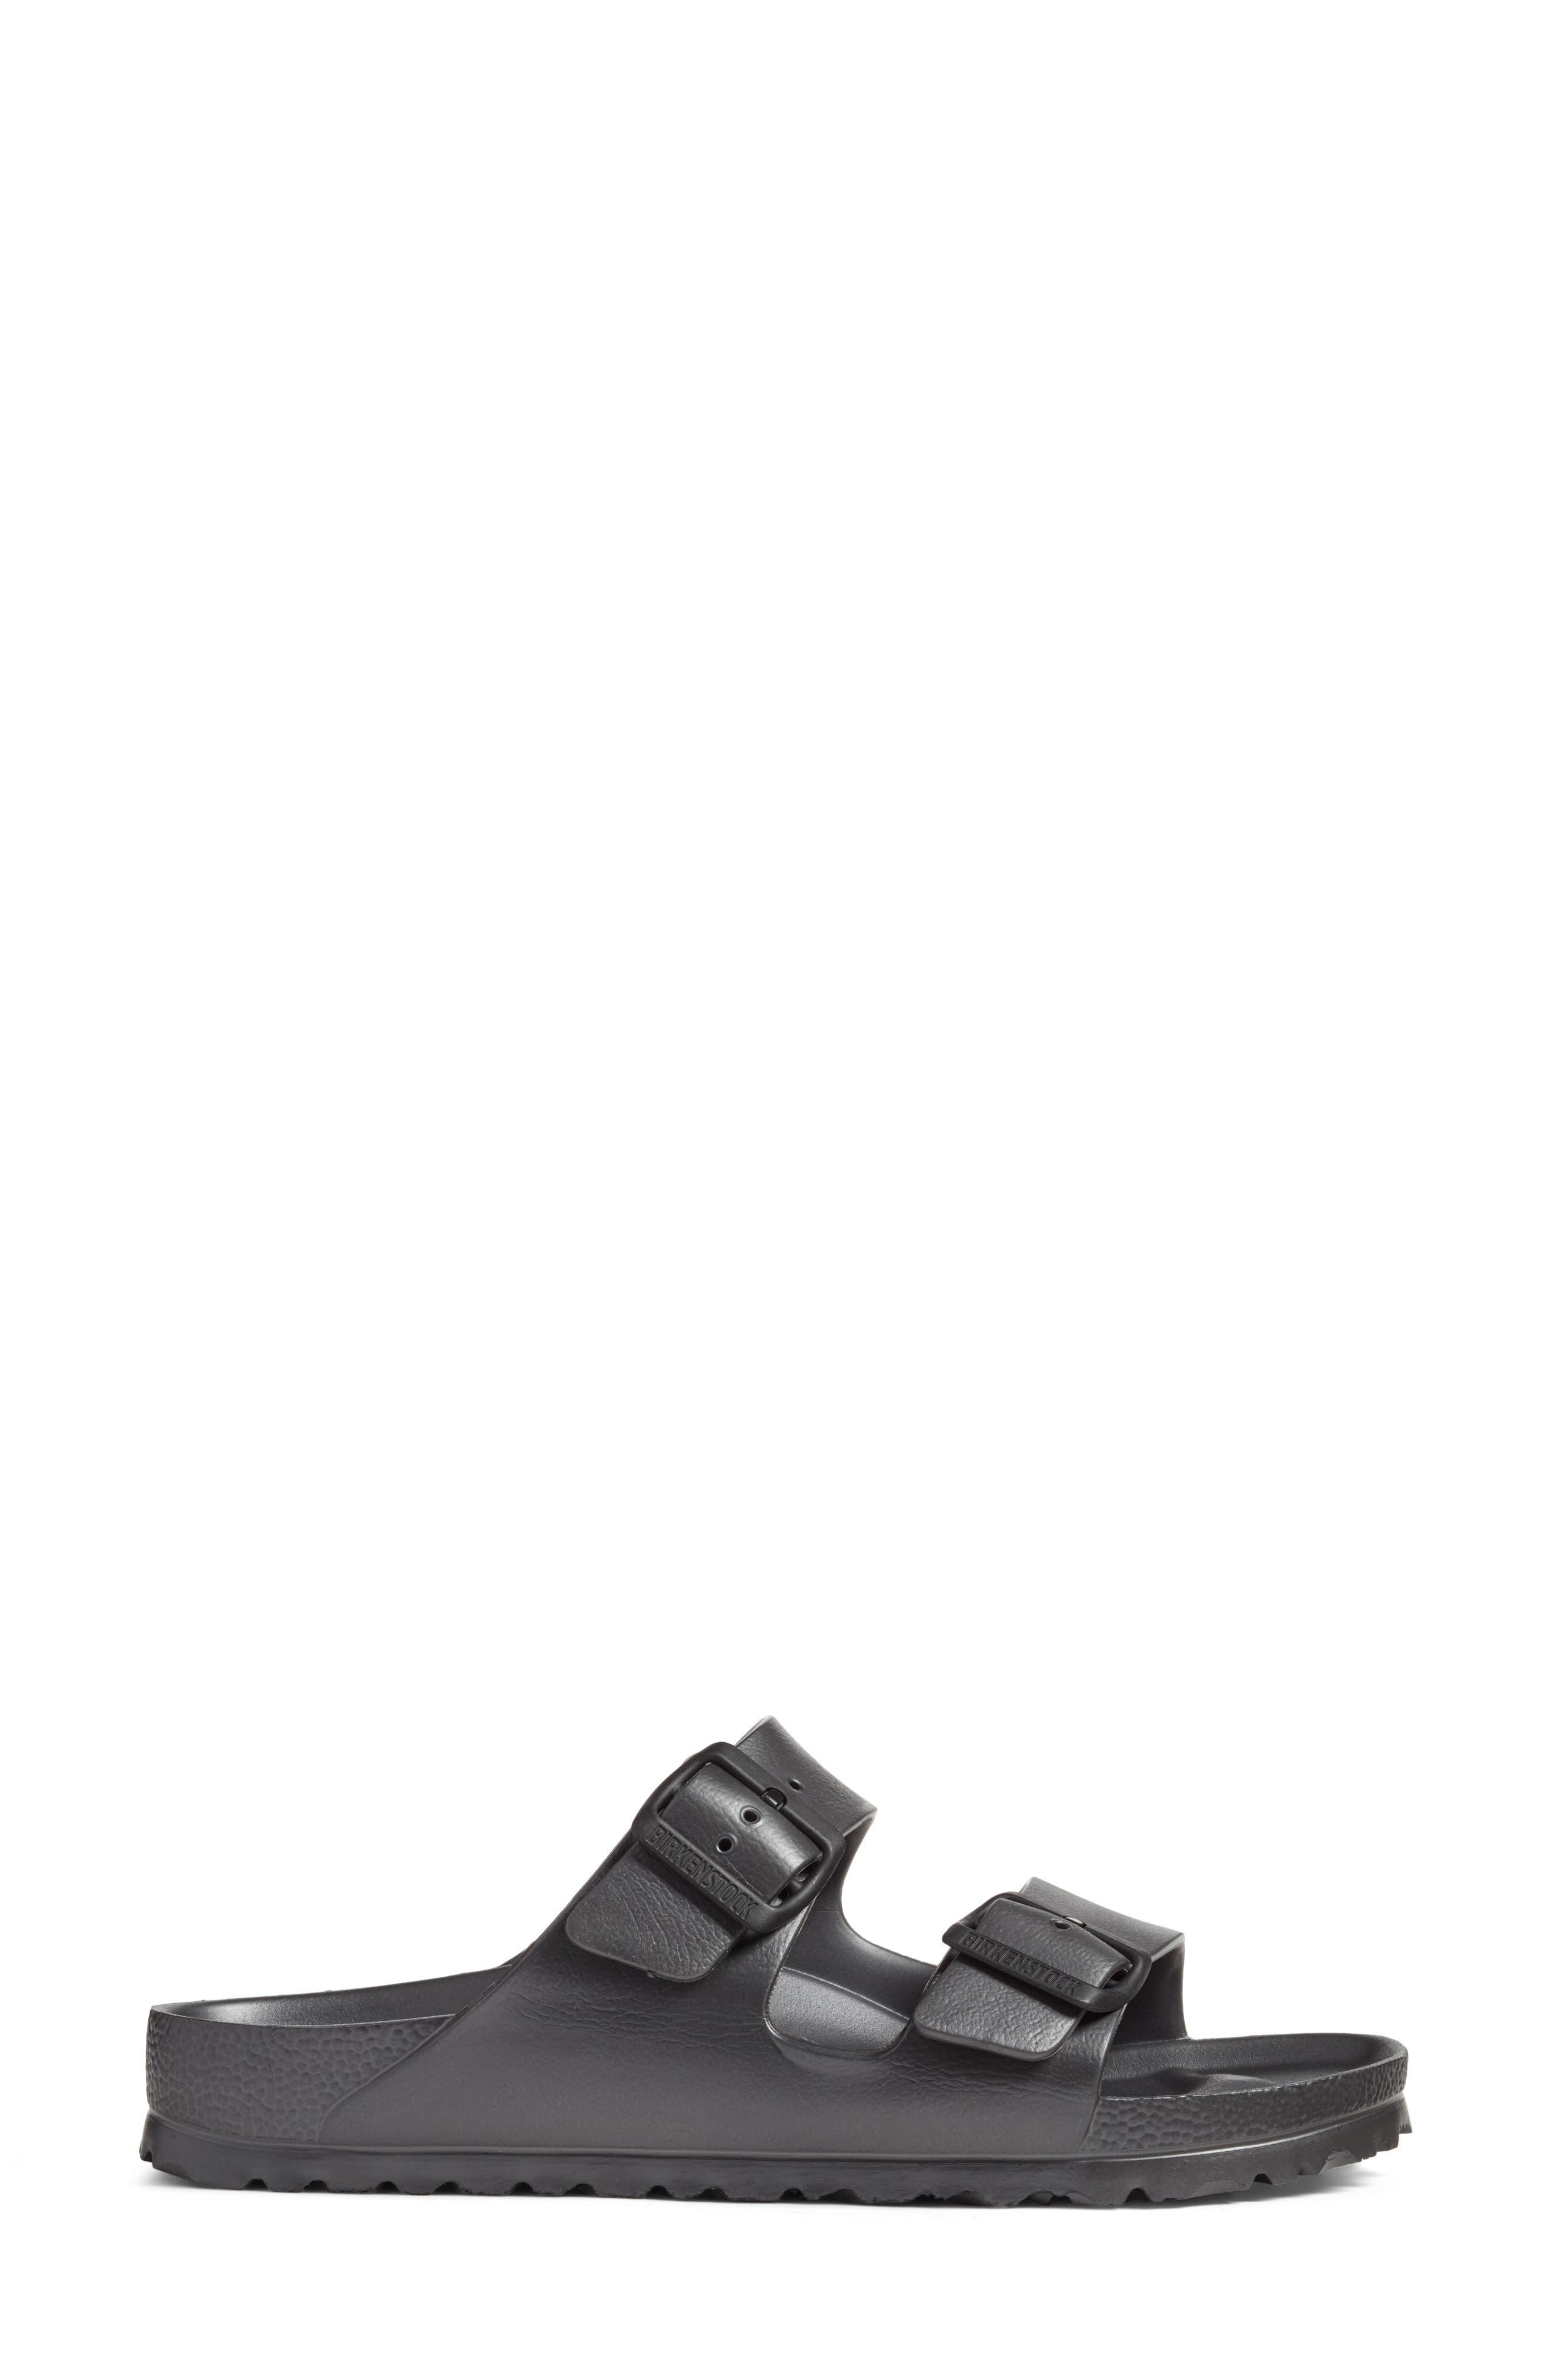 Essentials - Arizona Slide Sandal,                             Alternate thumbnail 3, color,                             Metallic Anthracite